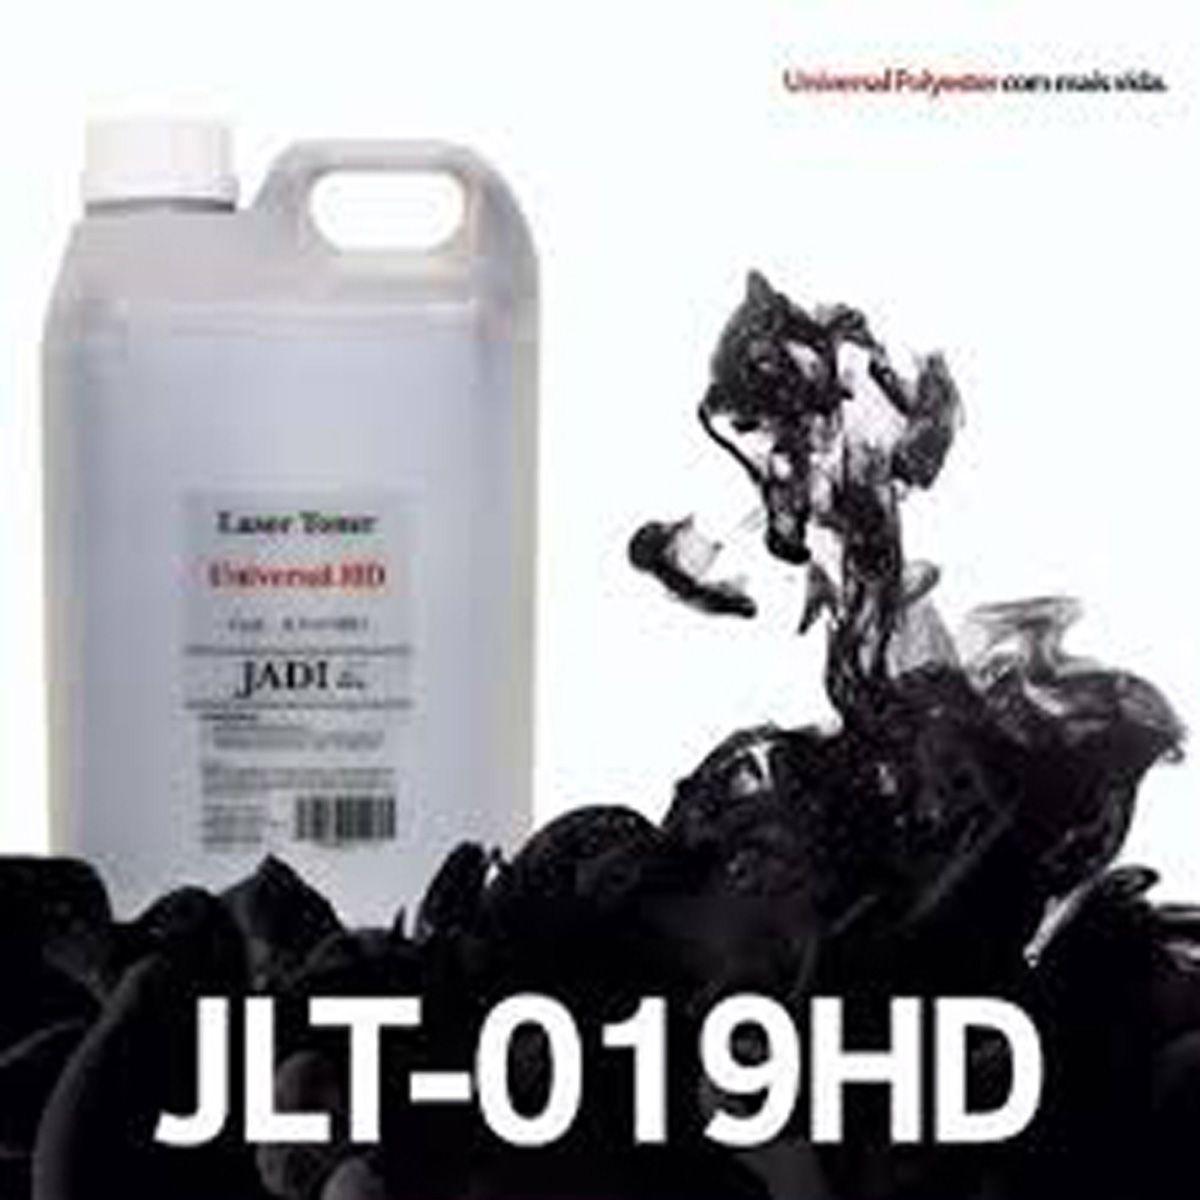 Pó Toner Samsung Jadi JLT-019 JLT019 - Universal - 1 kg